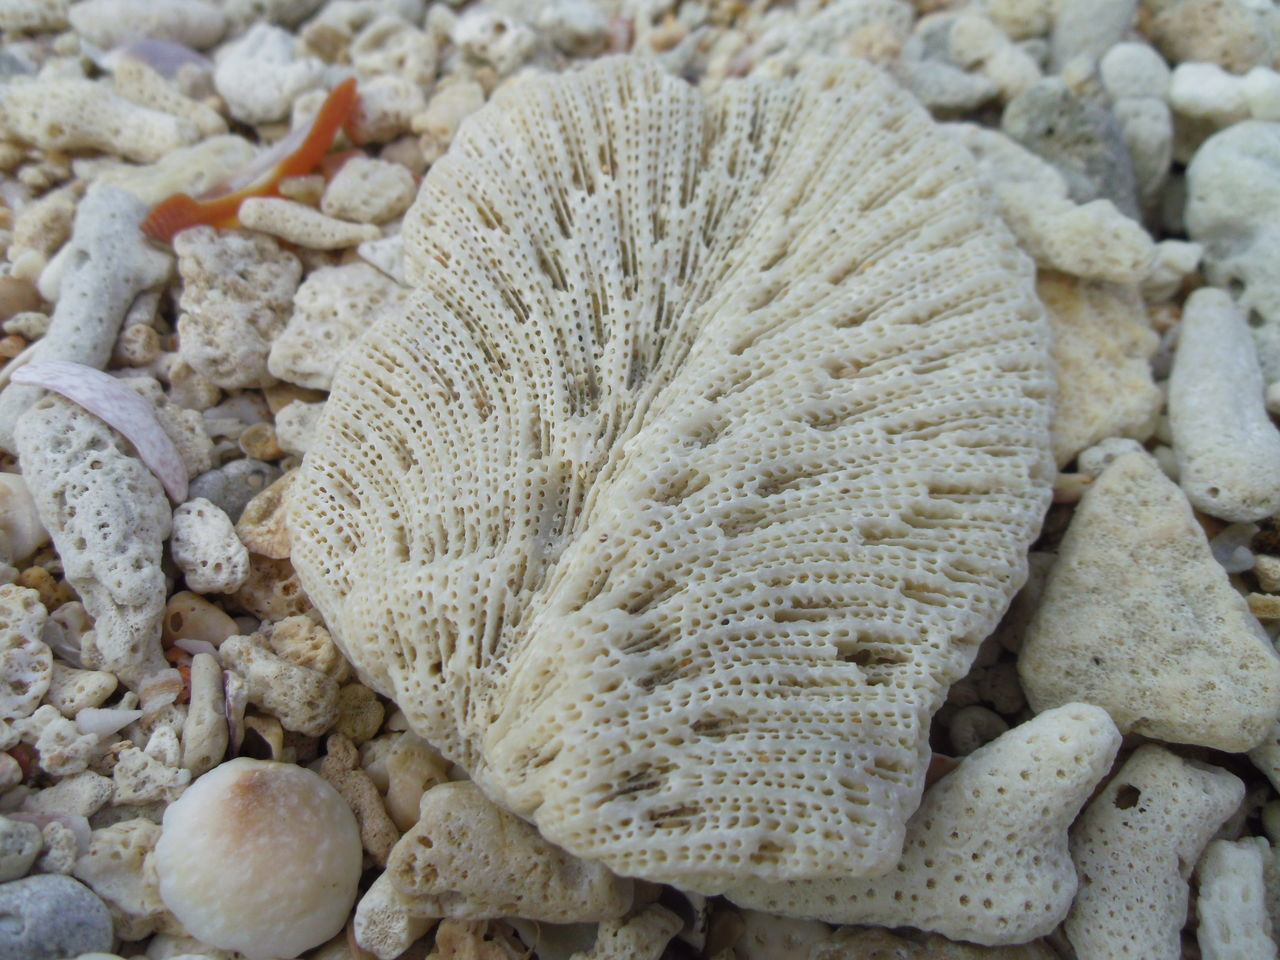 Beach Gastropoda